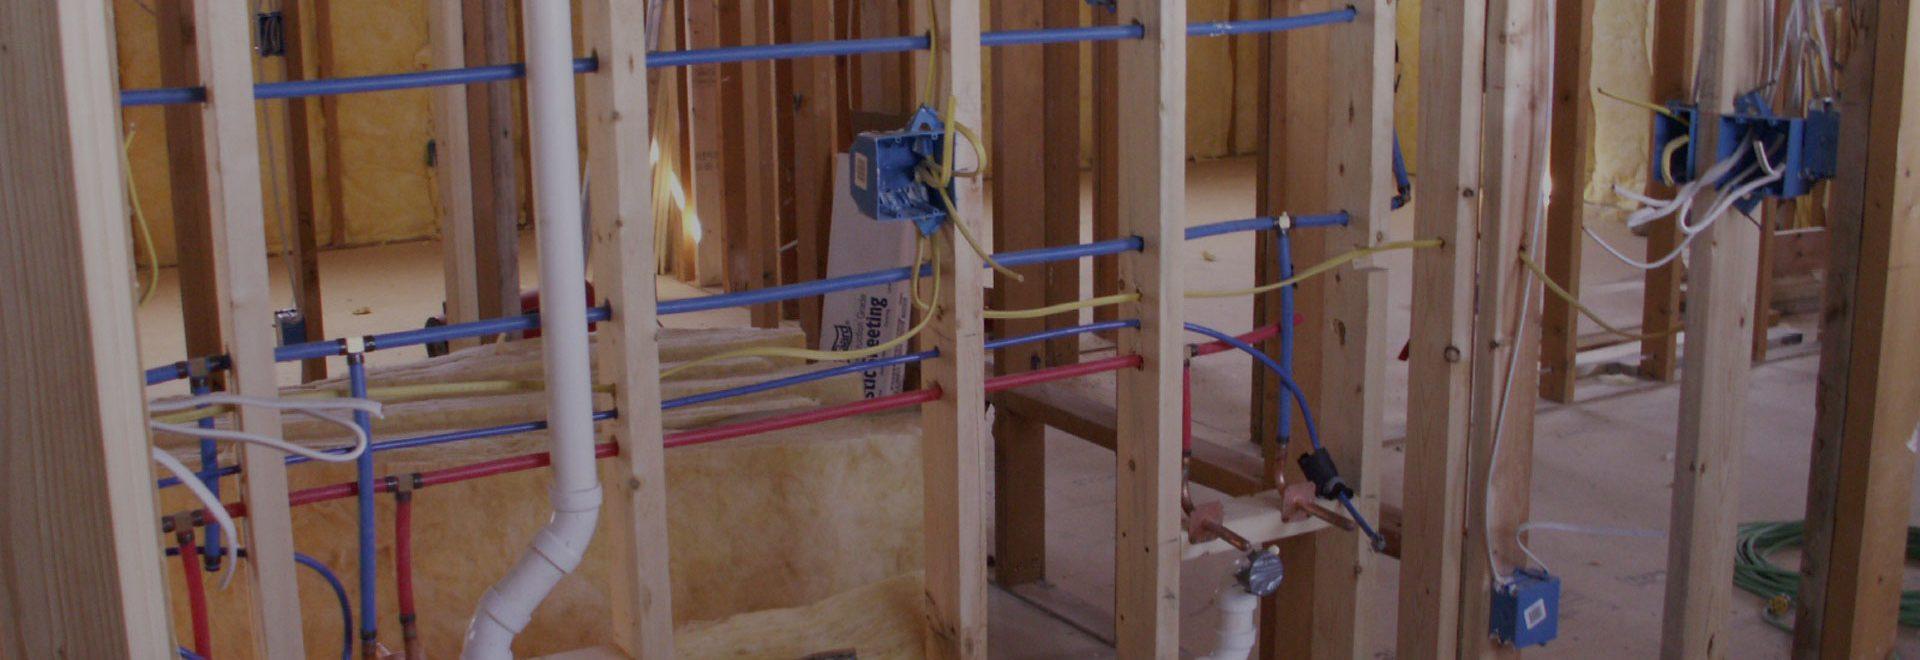 Как провести электропроводку в каркасном доме своими руками